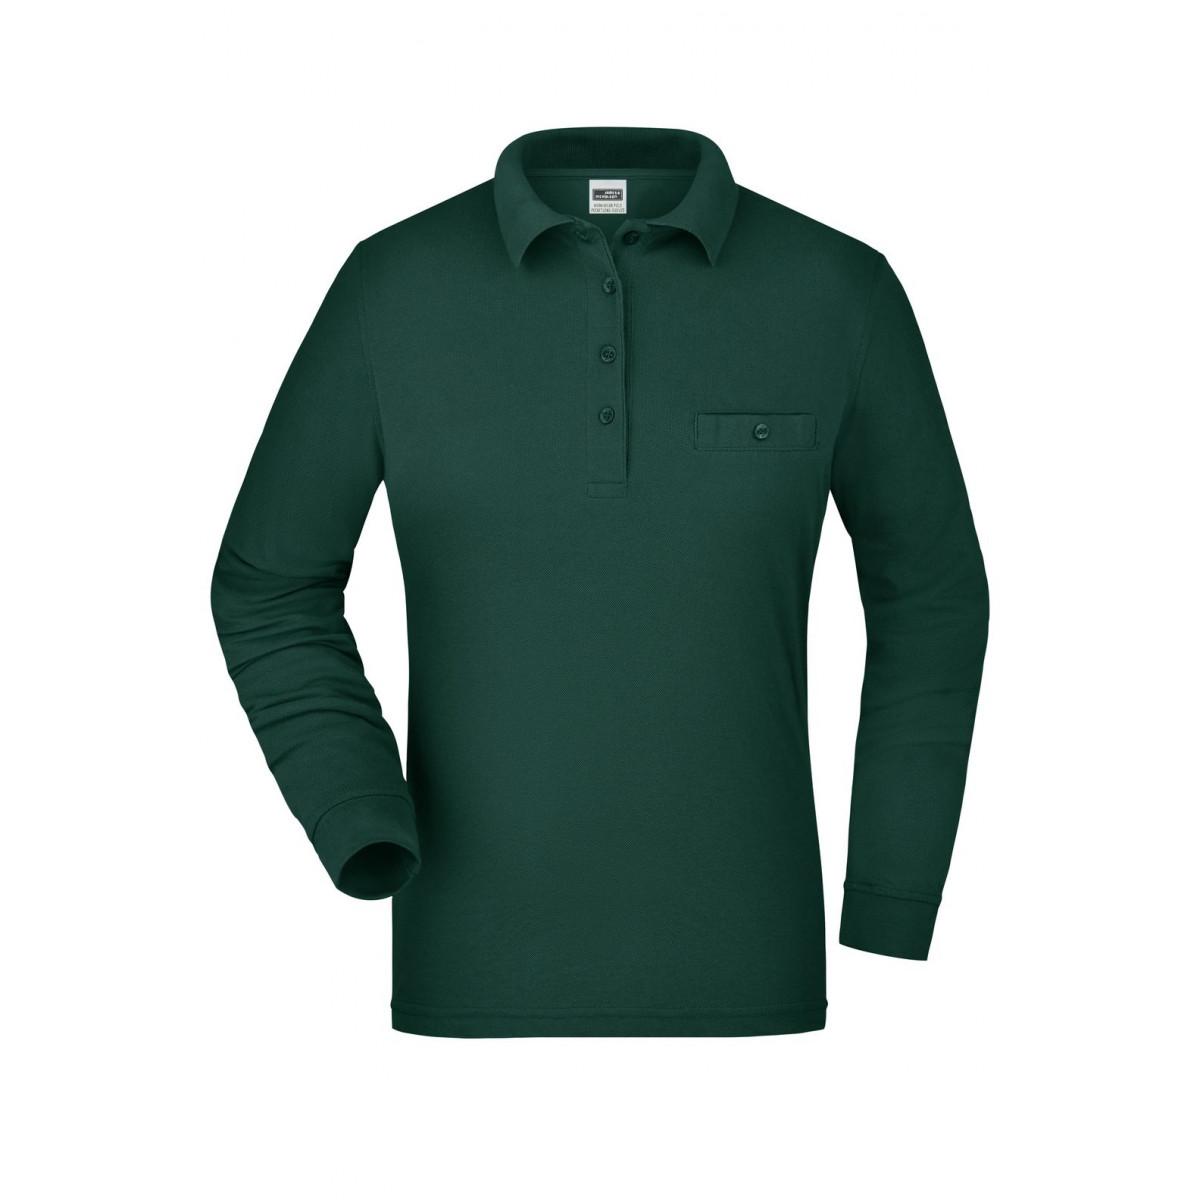 Рубашка поло женская JN865 Ladies Workwear Polo Pocket Longsleeve - Темно-зеленый